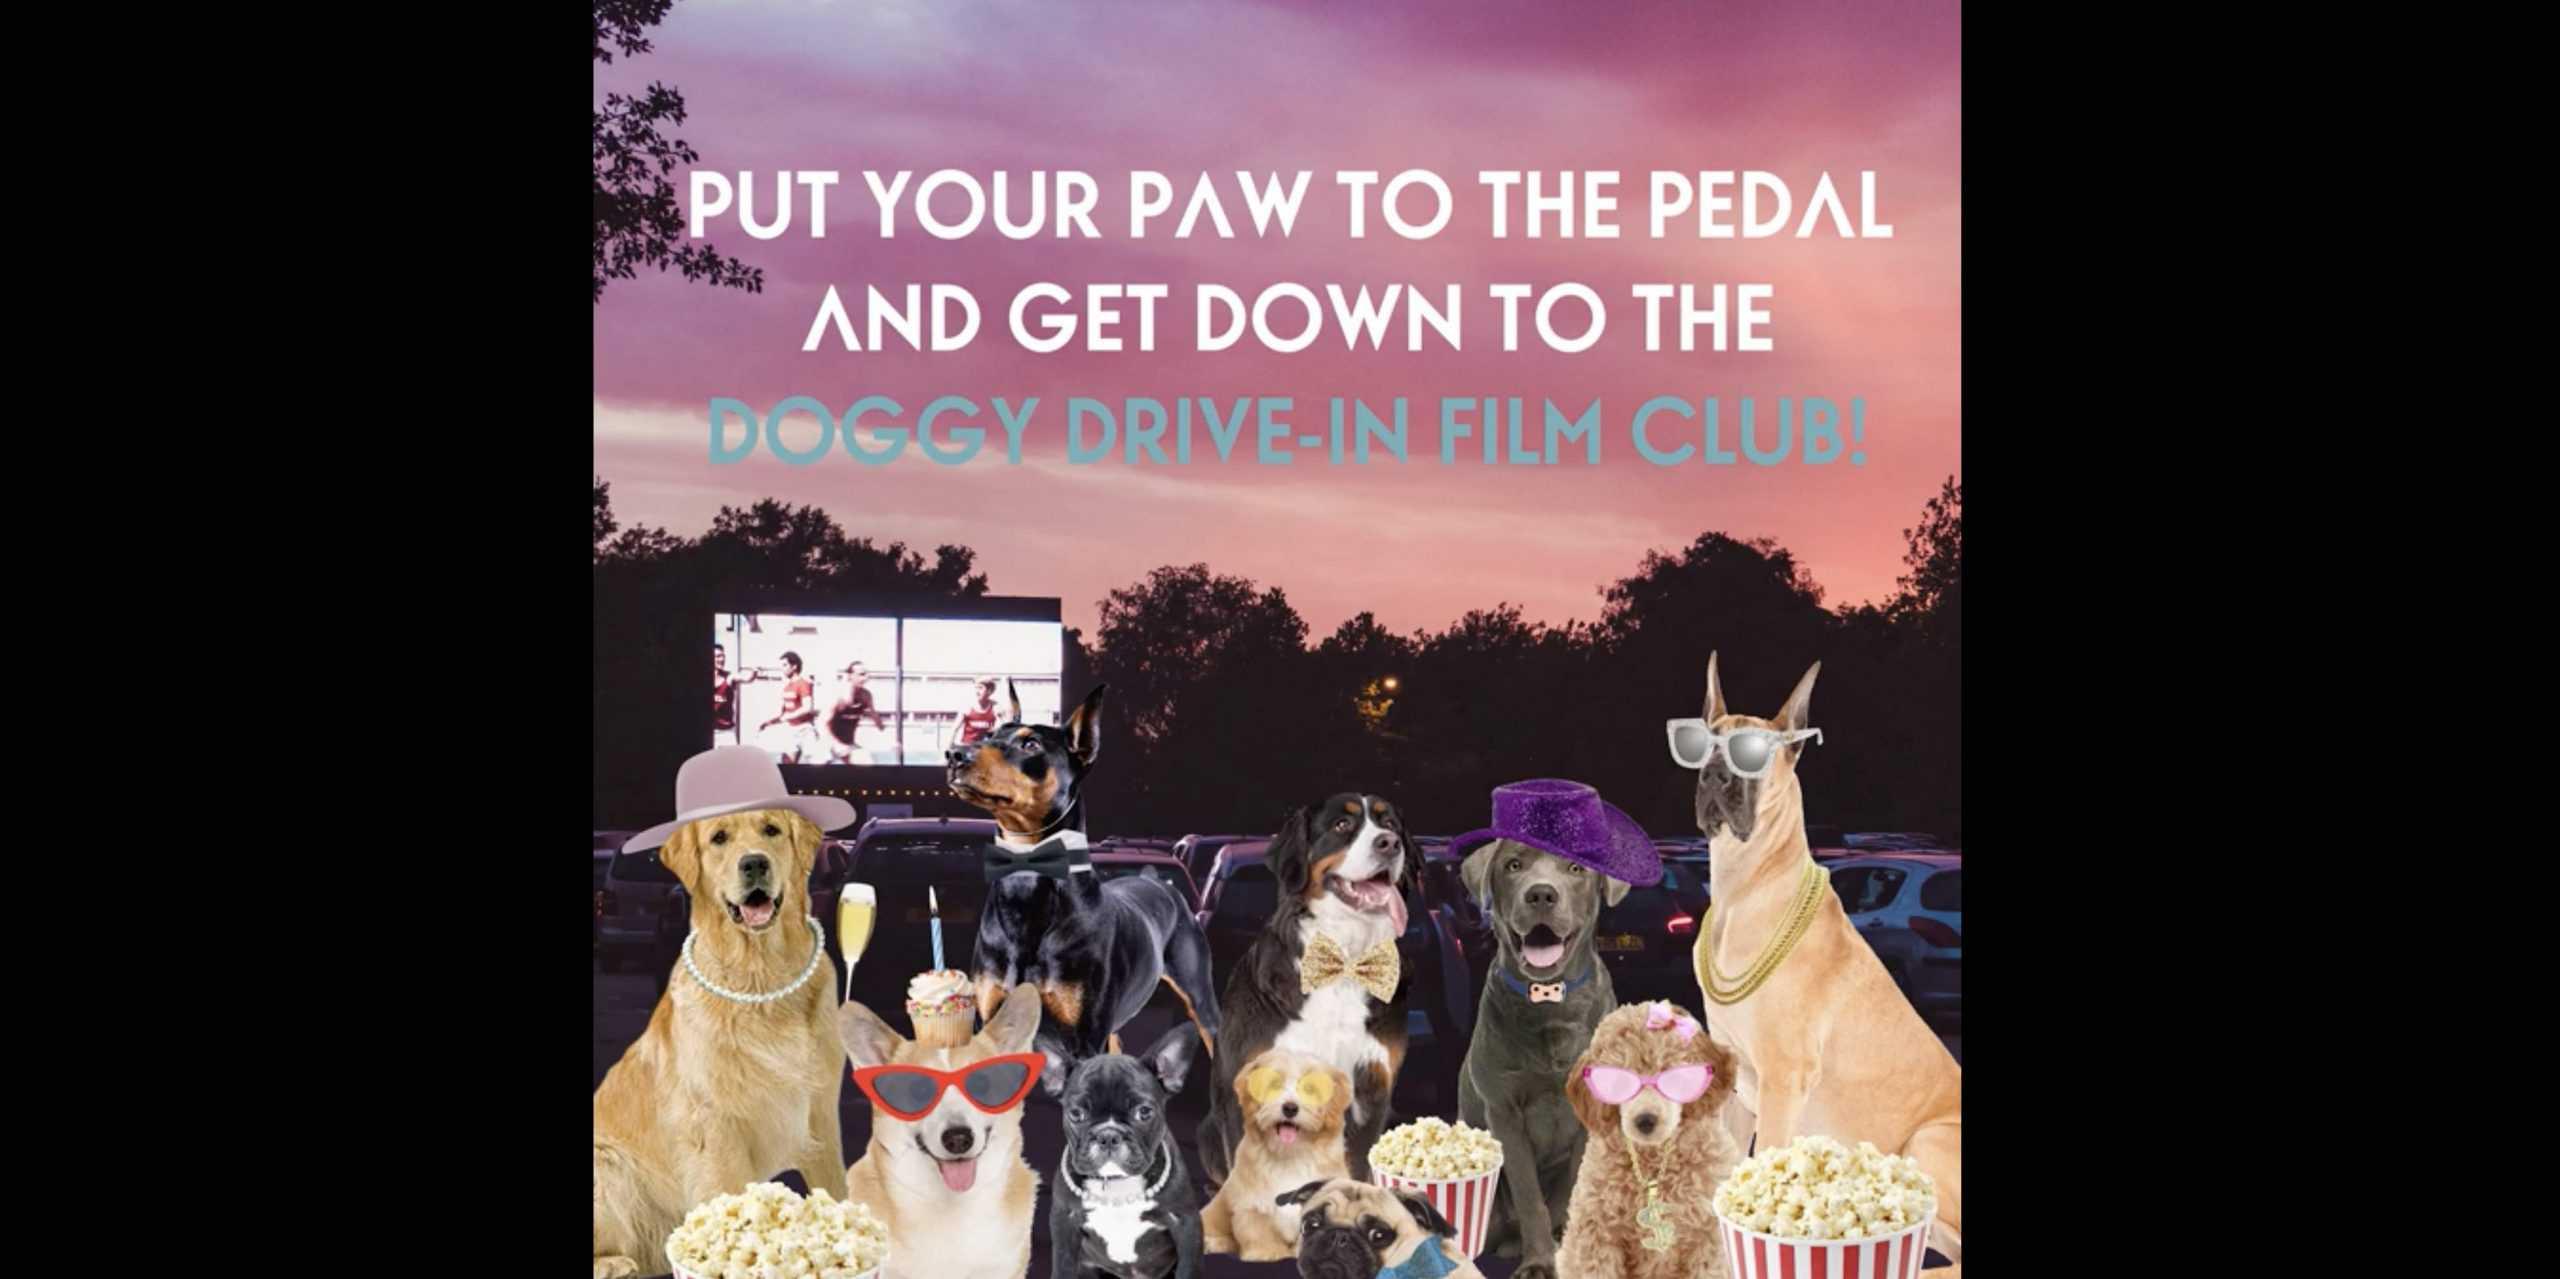 Doggy Drive In Film Club Sandown Park Racecourse - Rooftop Film Club